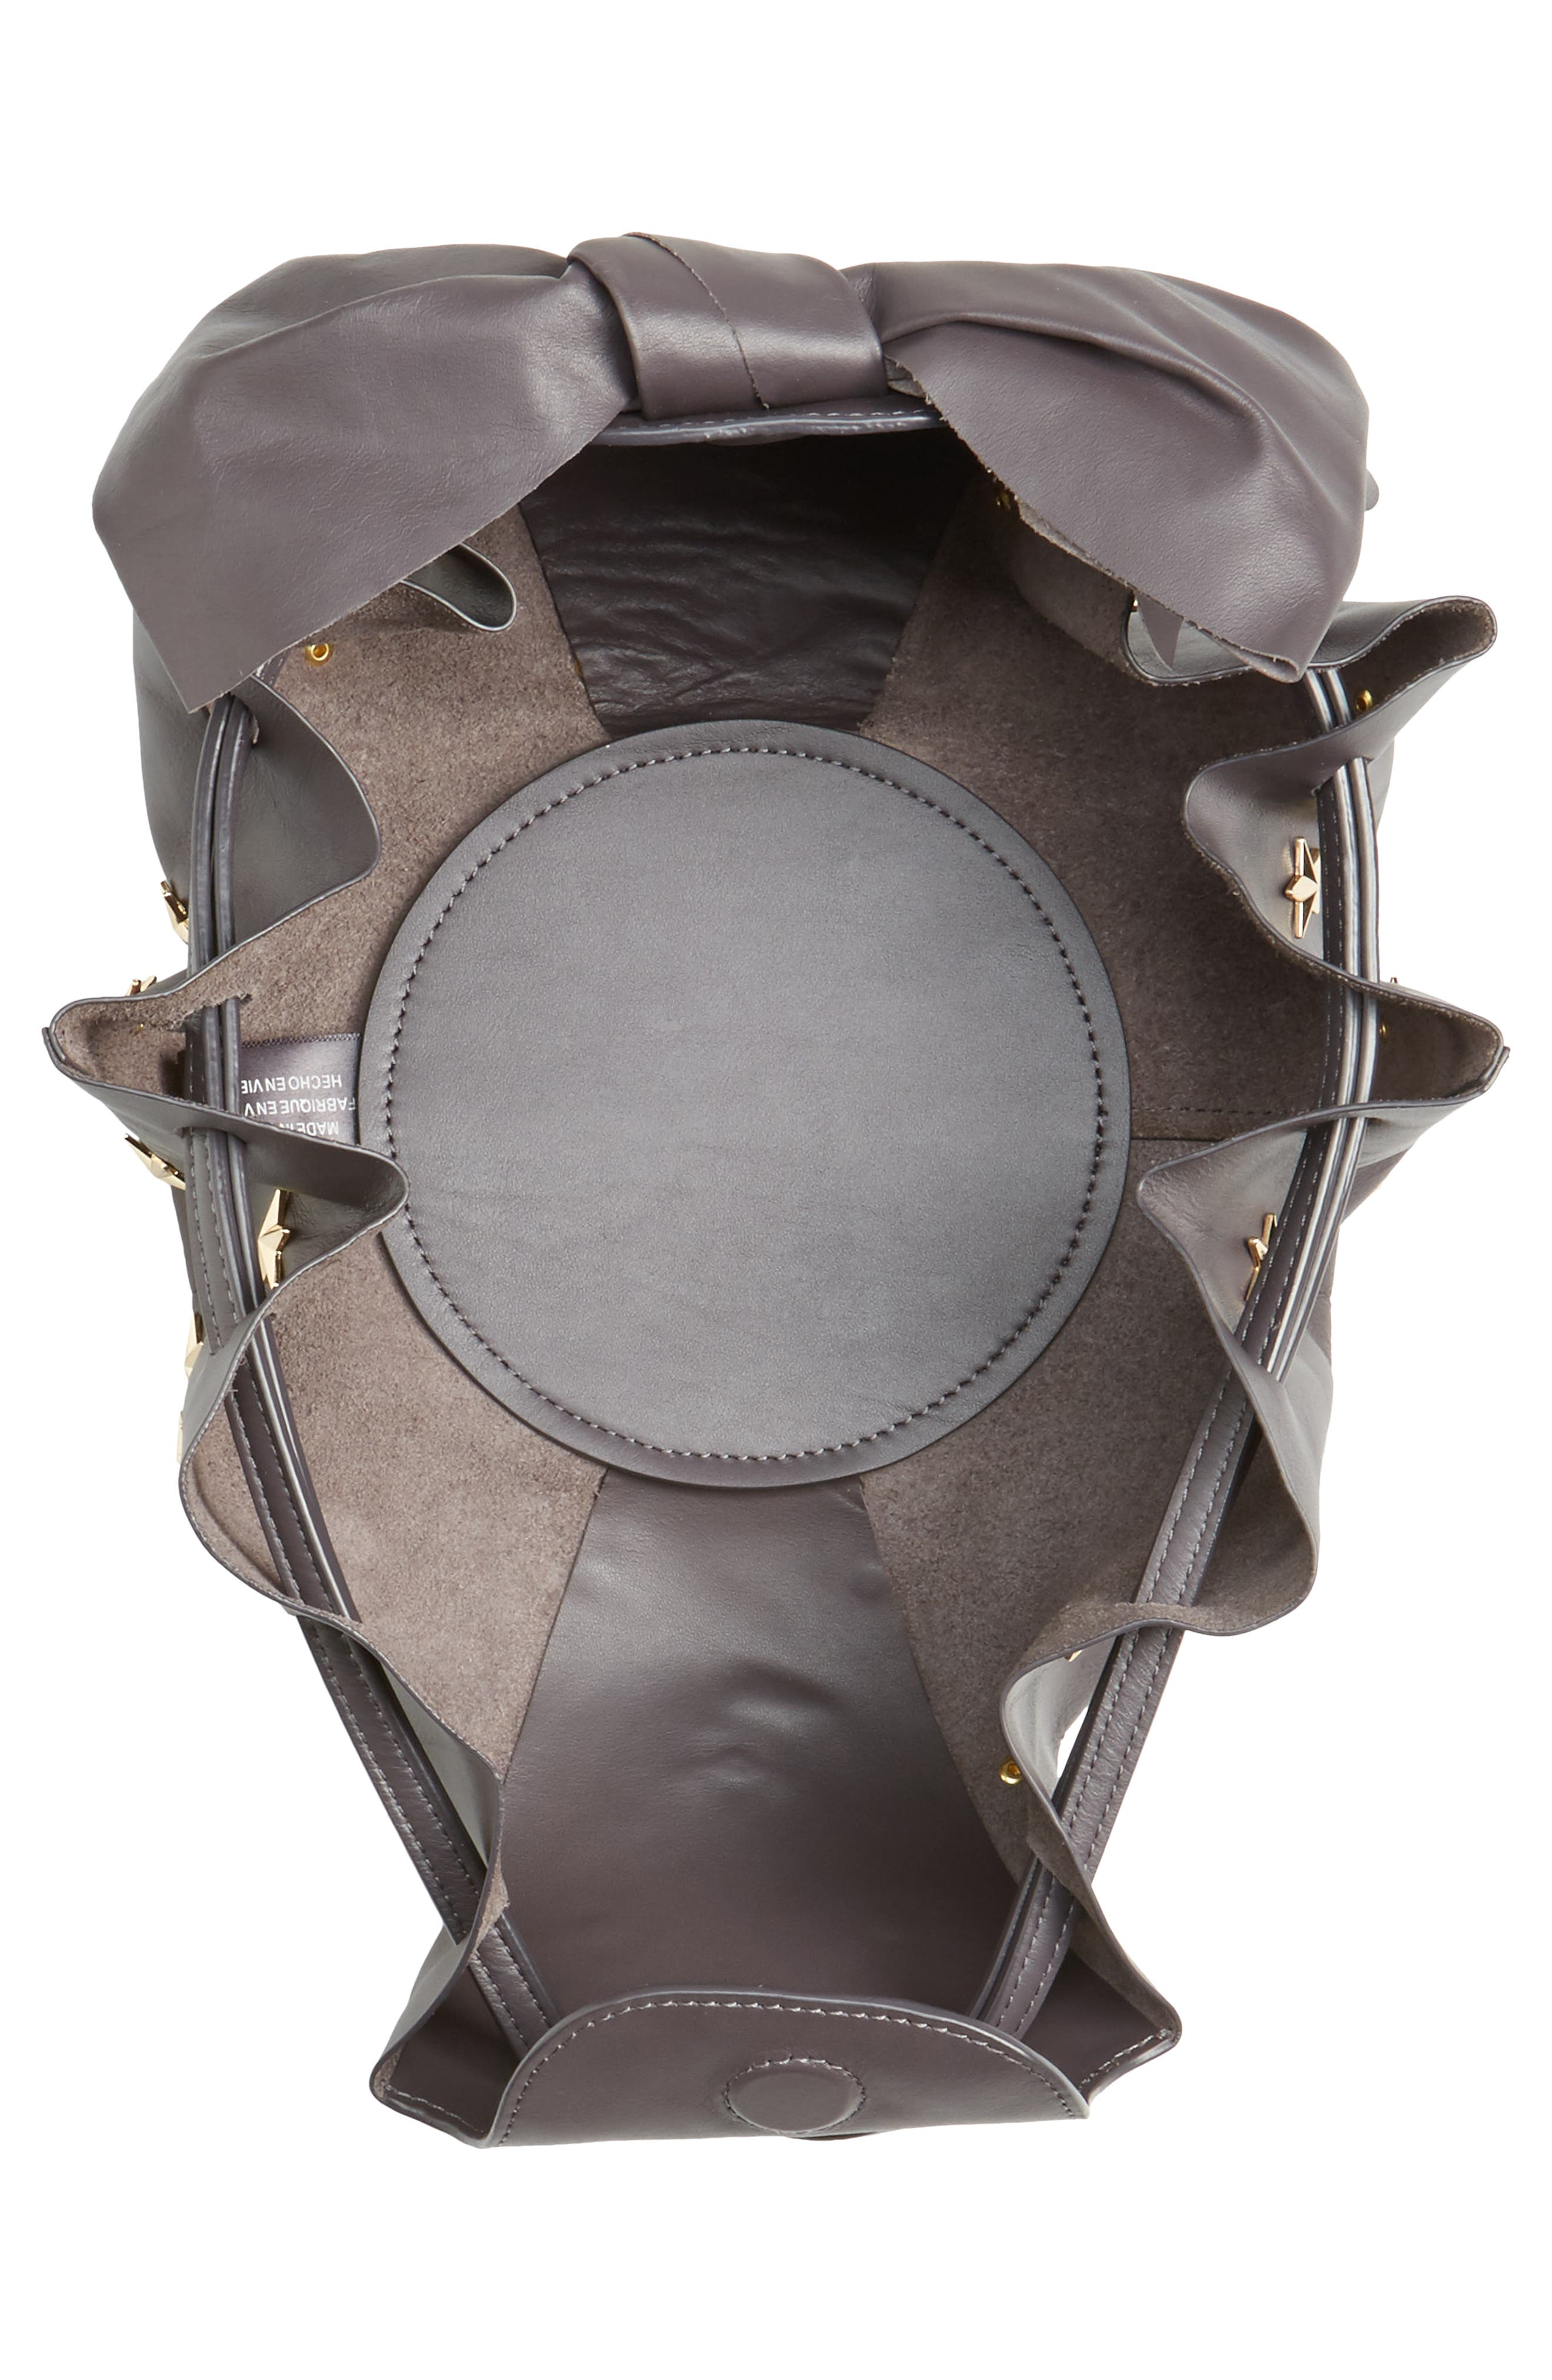 Soirée Star Stud Leather Crossbody Bag,                             Alternate thumbnail 4, color,                             020